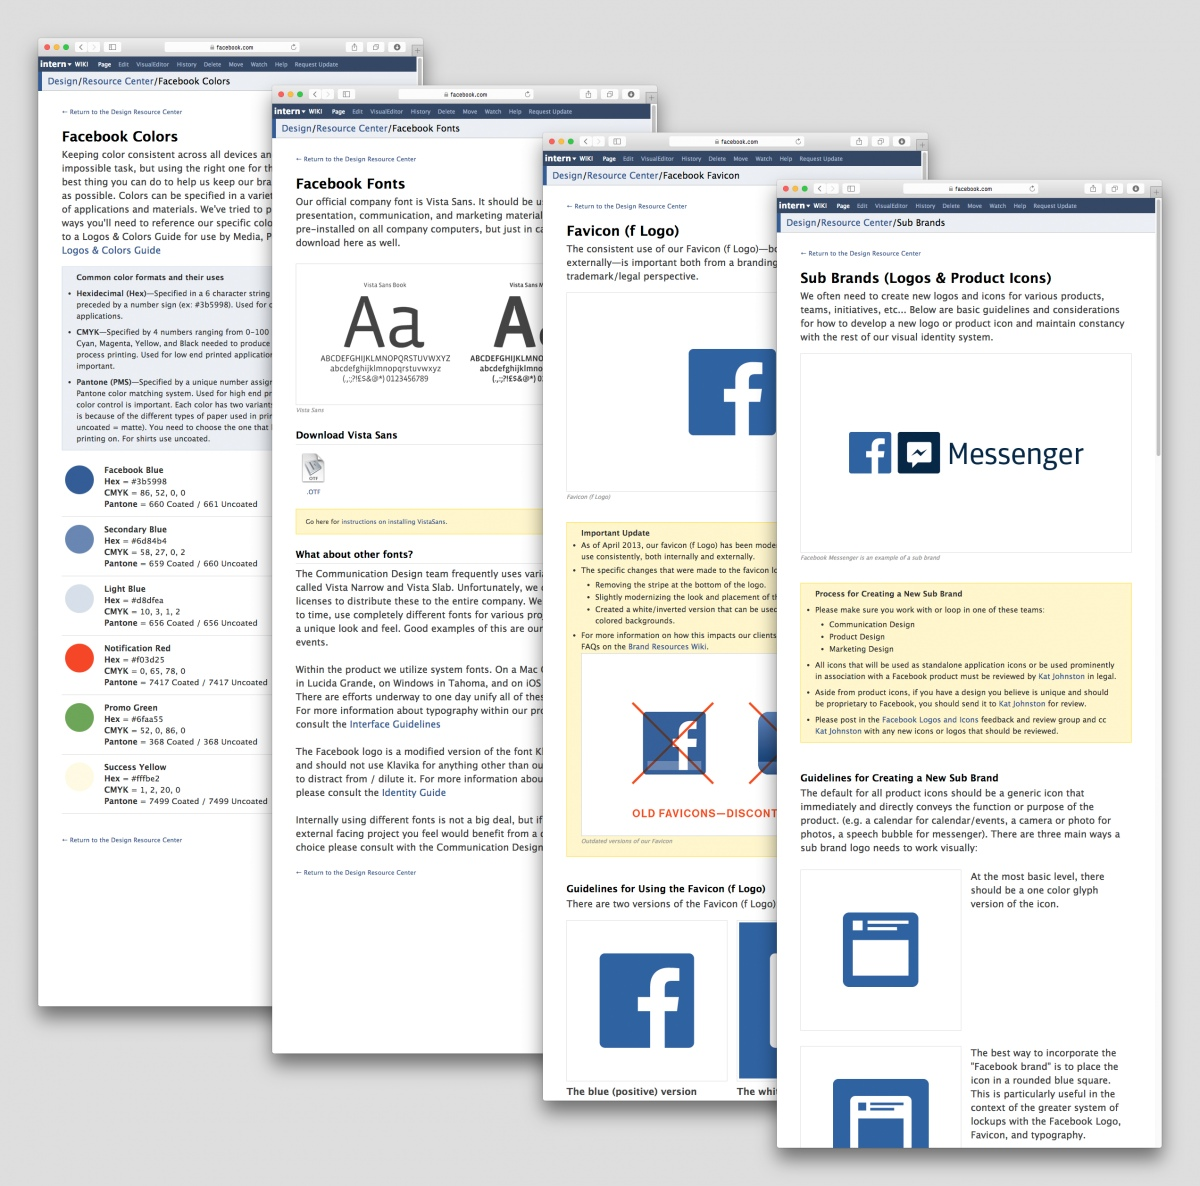 1 Year's Work on Facebook Identity